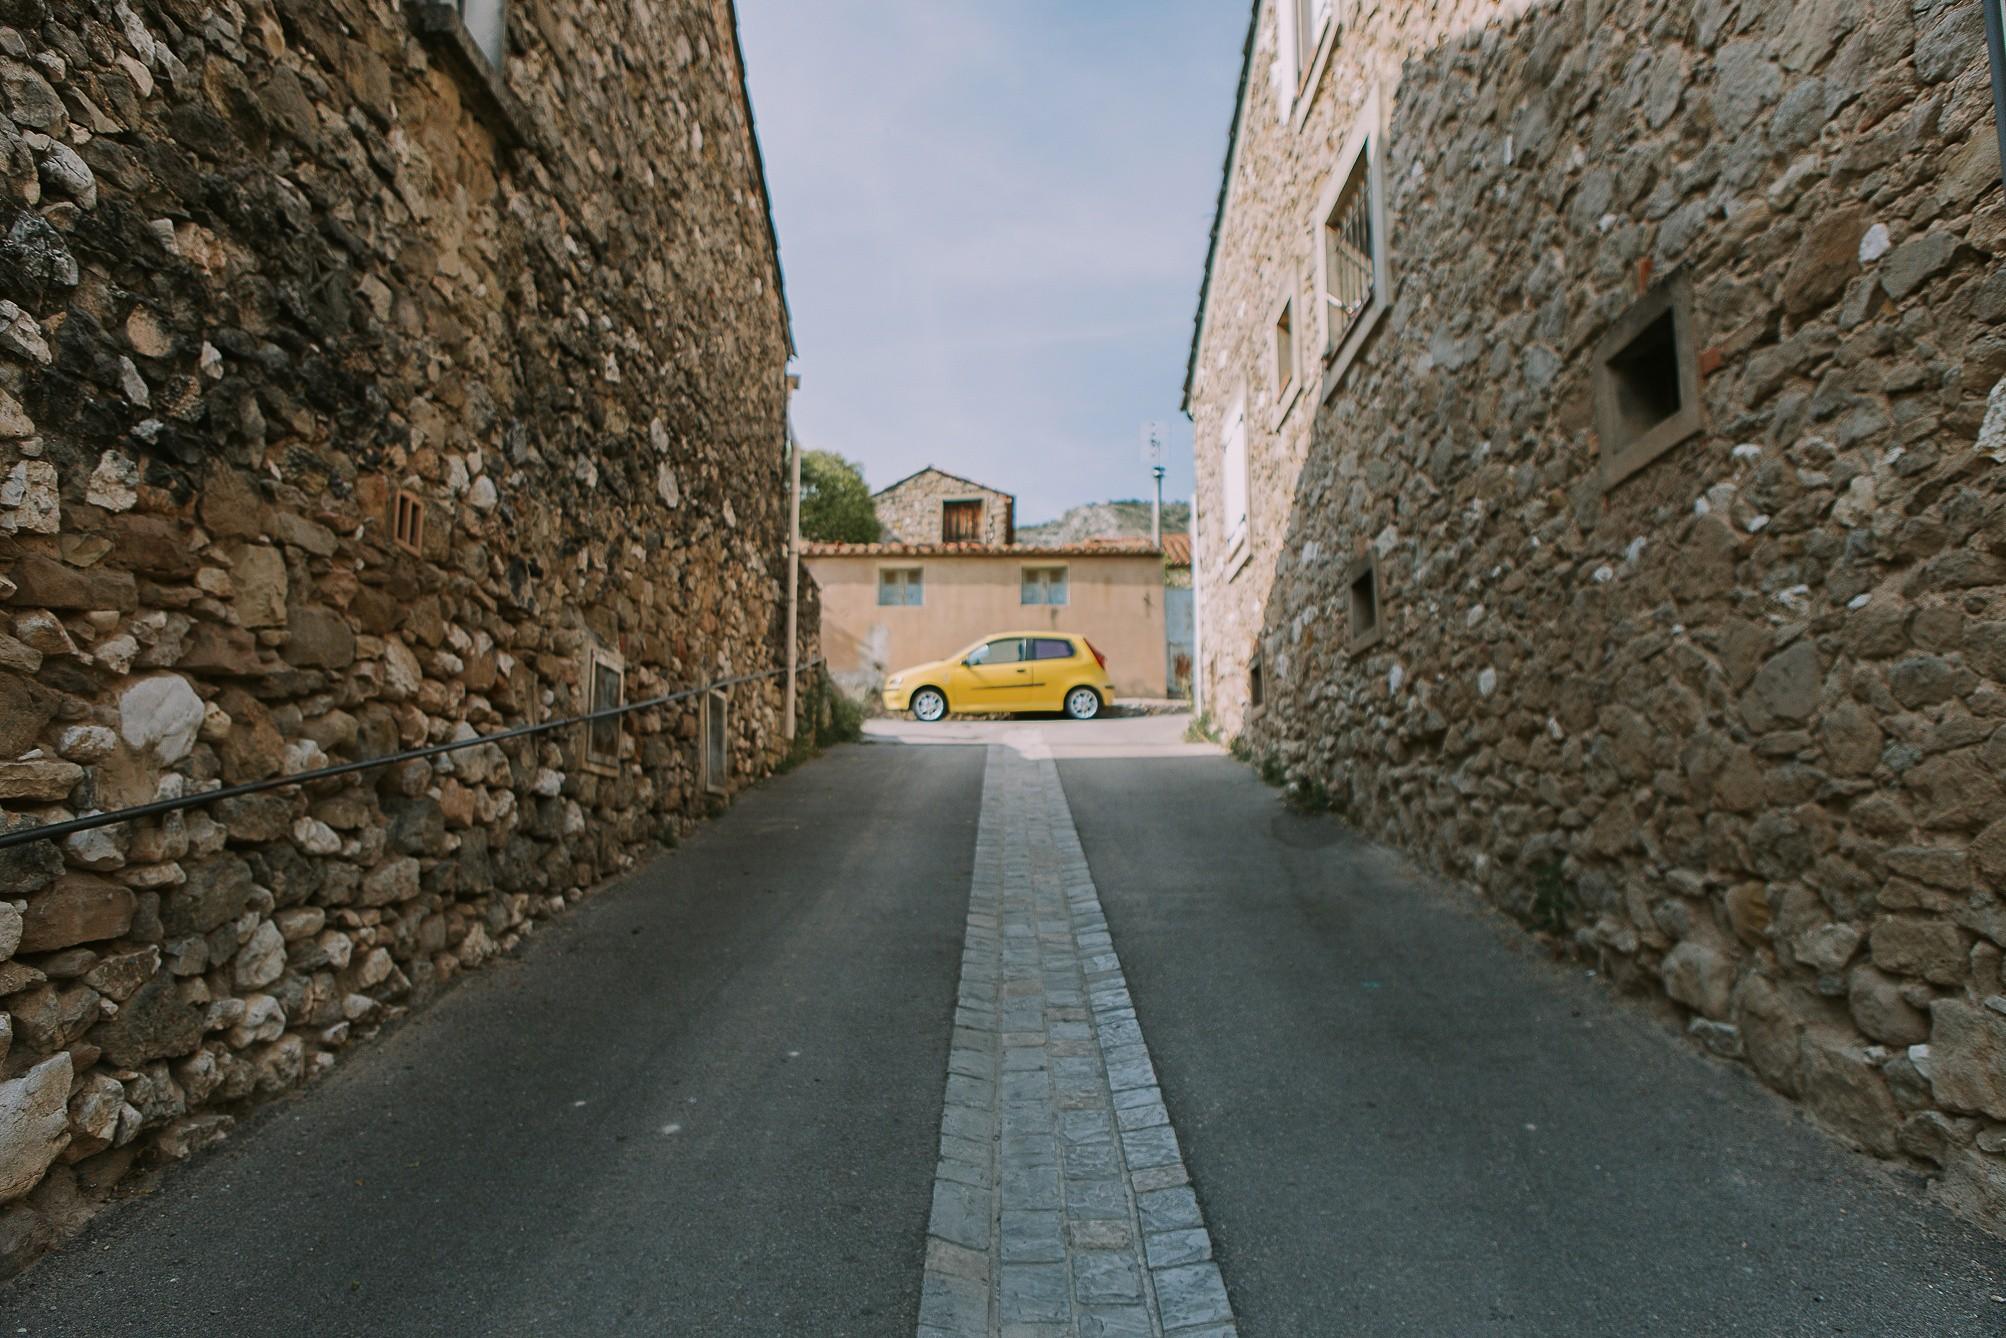 katerynaphotos-mariage-photographe-puyloubier-provence-aix-en-provence-sud-de-la-france_0383.jpg